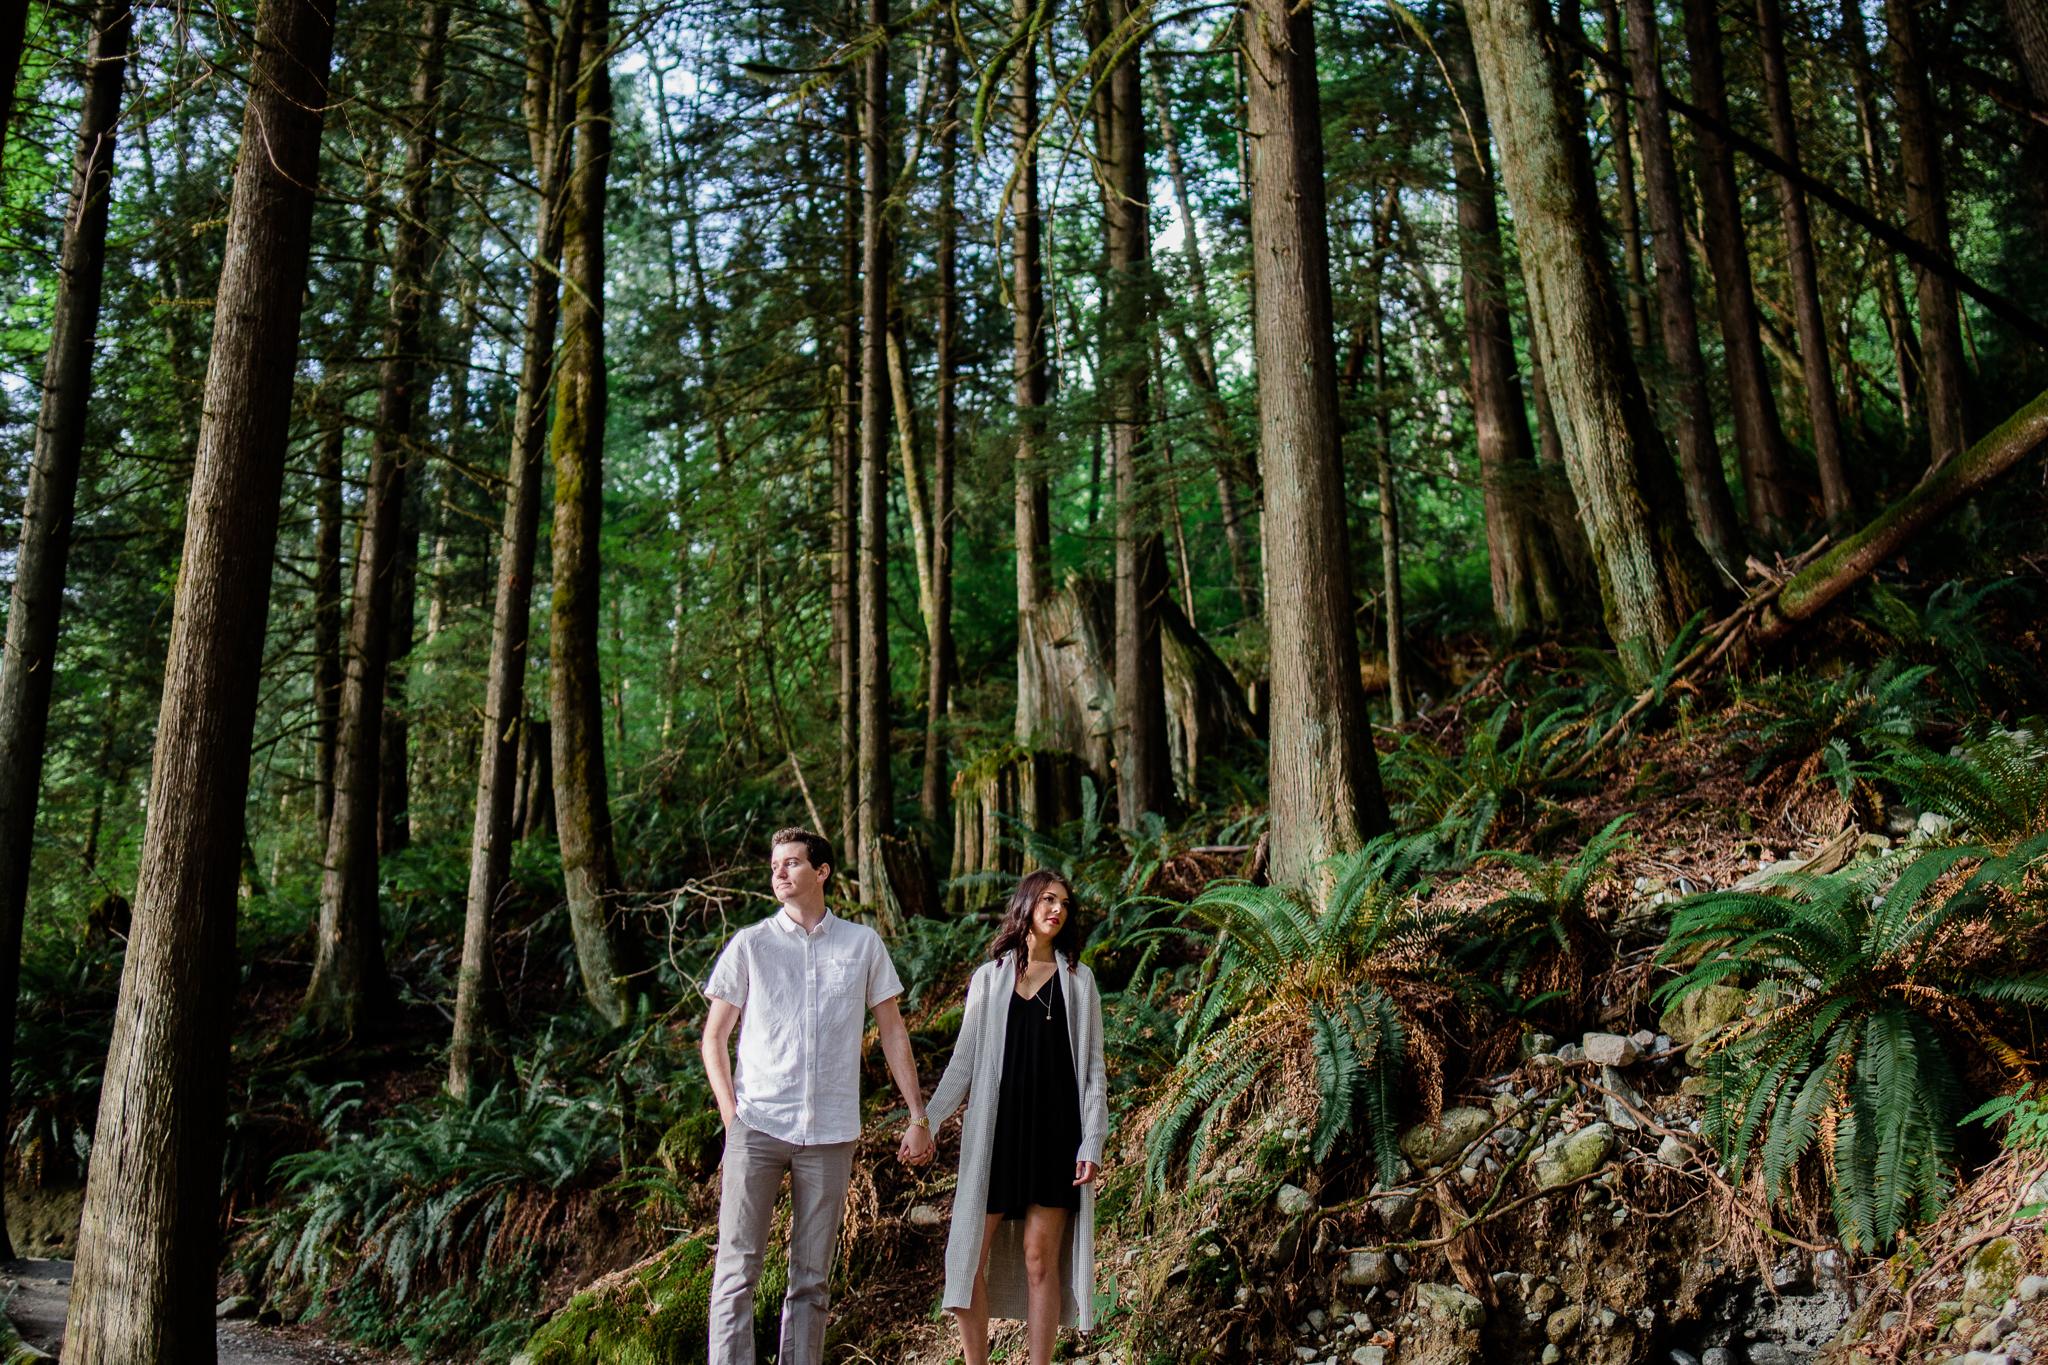 Photo of Buntzen Lake Anmore British Columbia Landscape Best Fun Engagement Photographer Port Moody Wedding Sunset Romantic Couple Photos 013.jpg